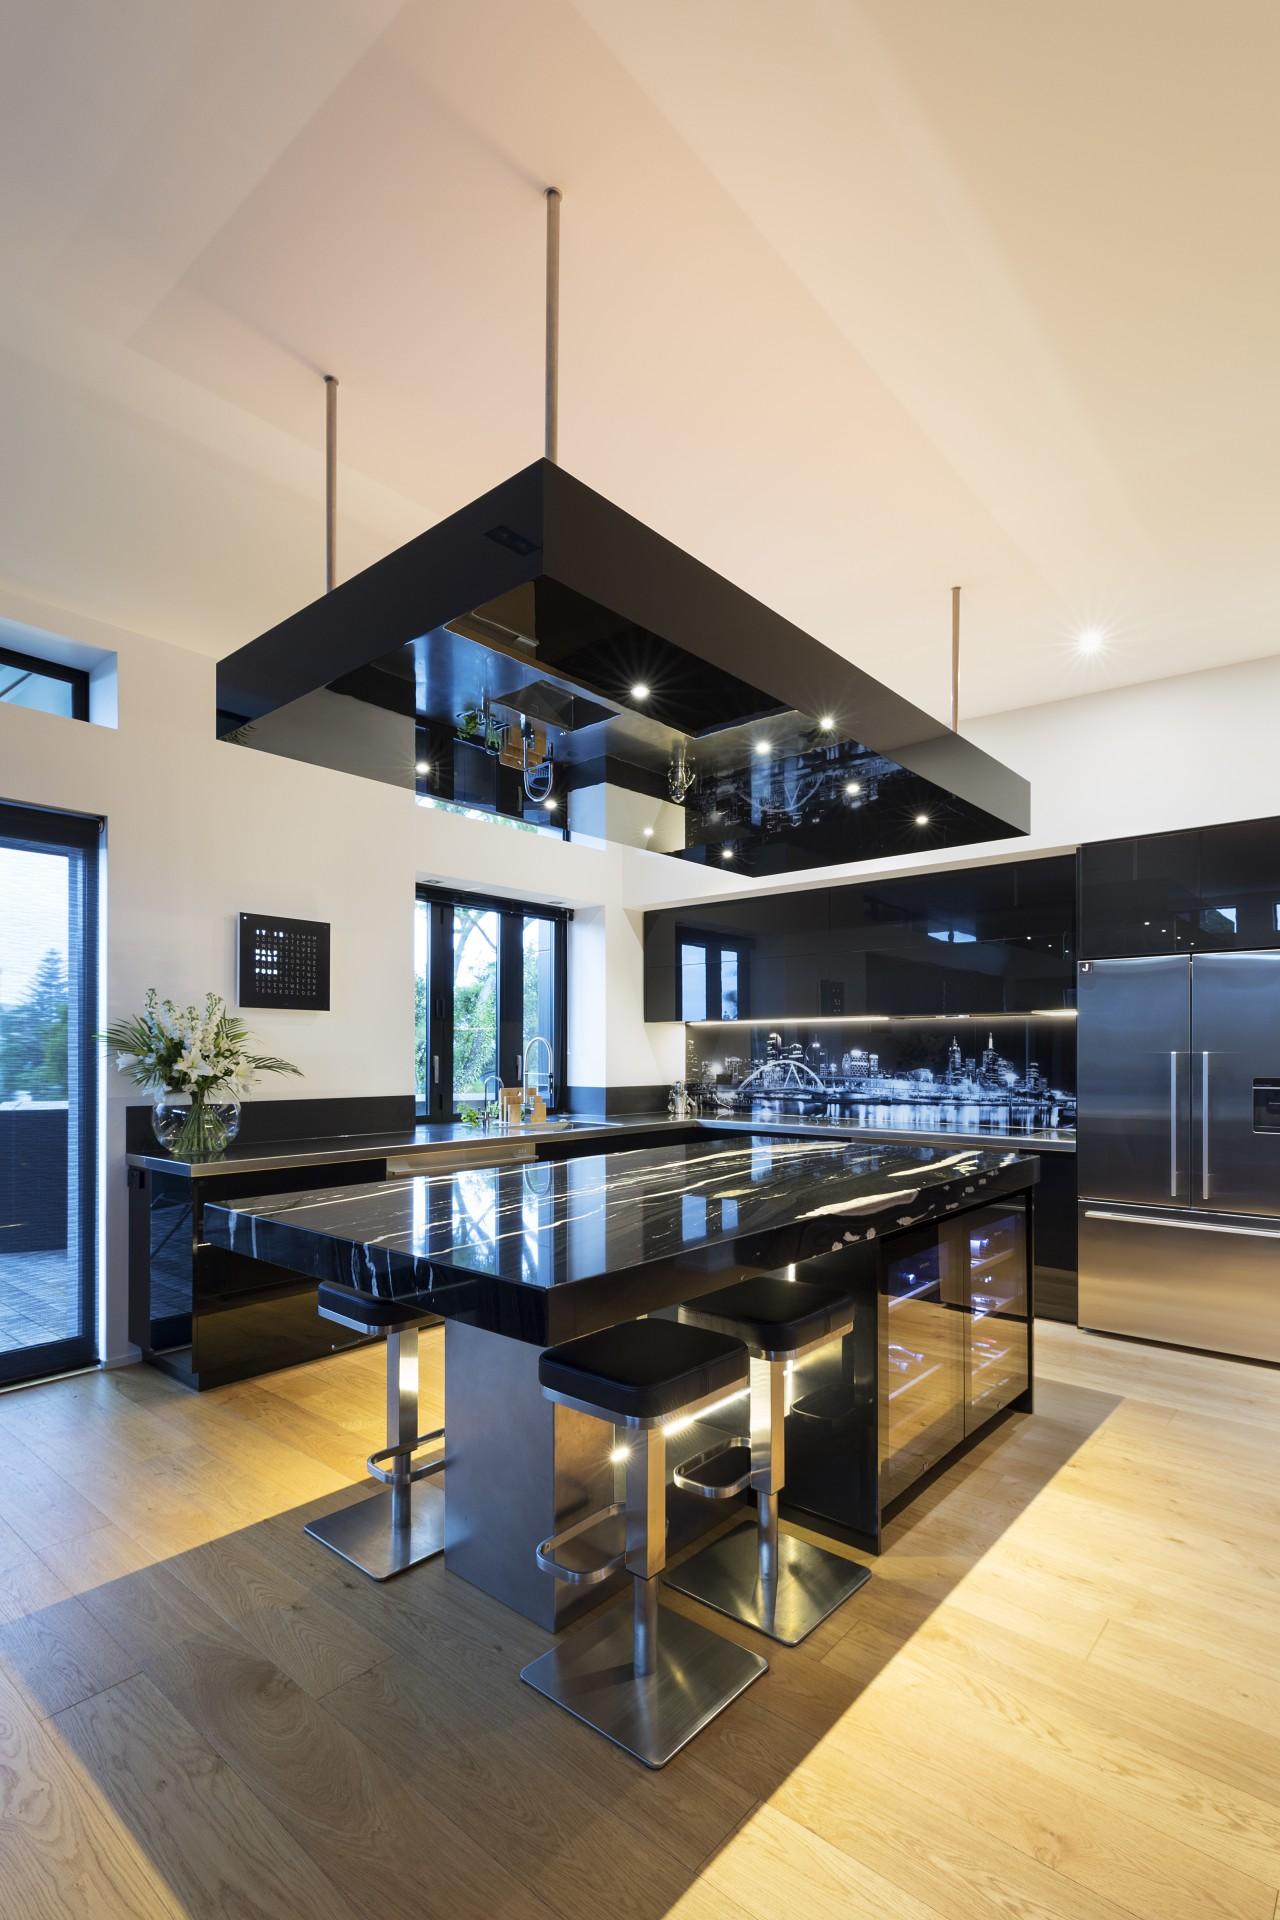 Copacabana granite was chosen for the island, which countertop, interior design, kitchen, table, orange